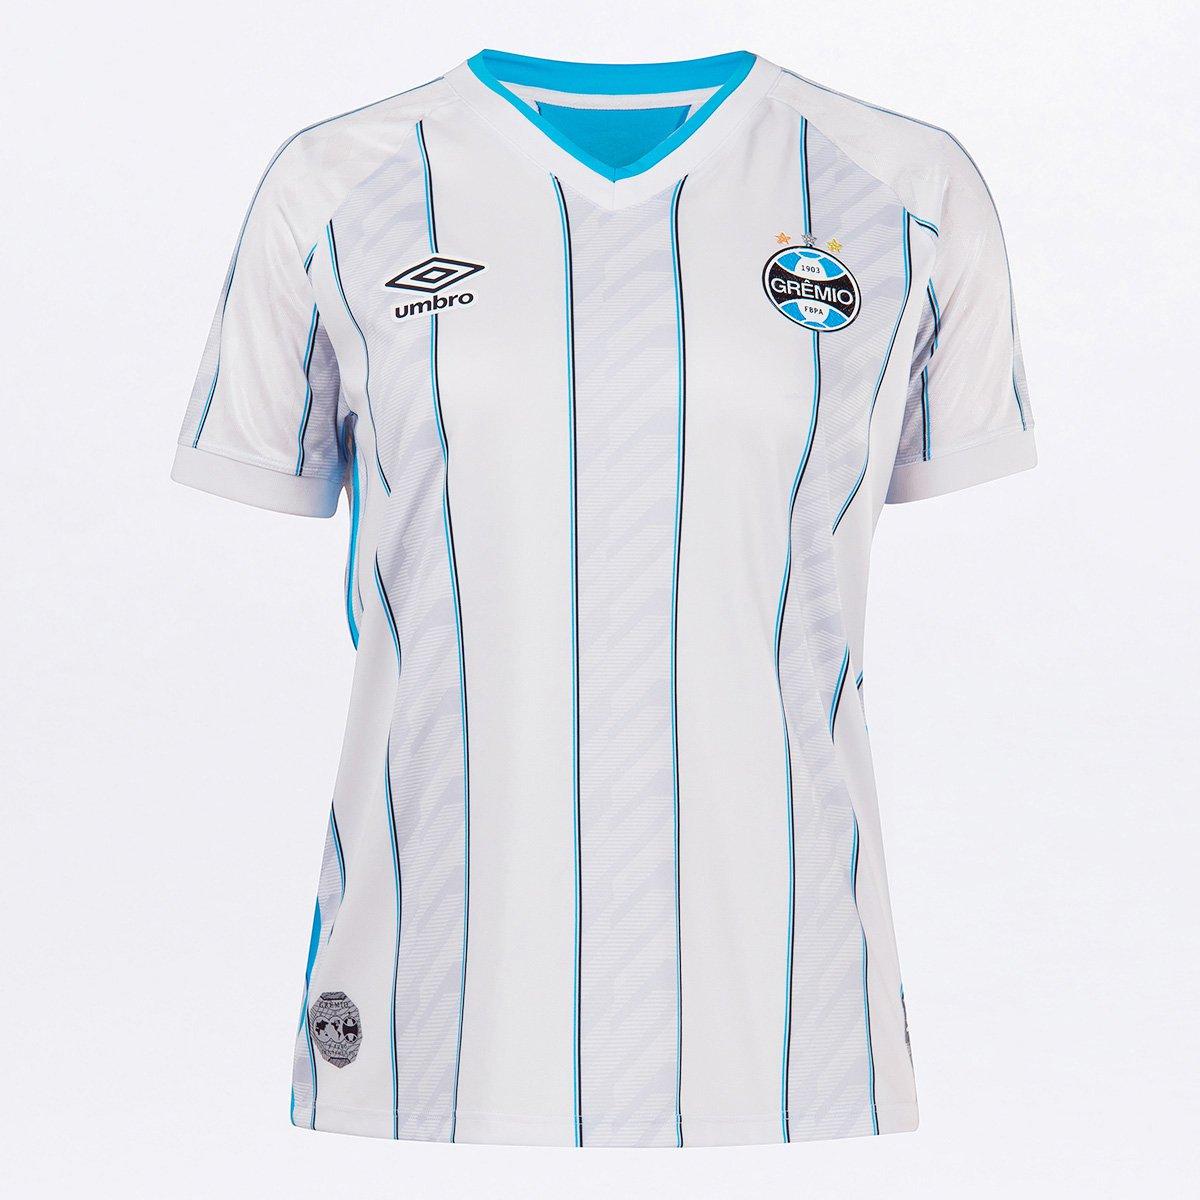 Camisa Grêmio II 20/21 s/n° Torcedor Umbro Feminina